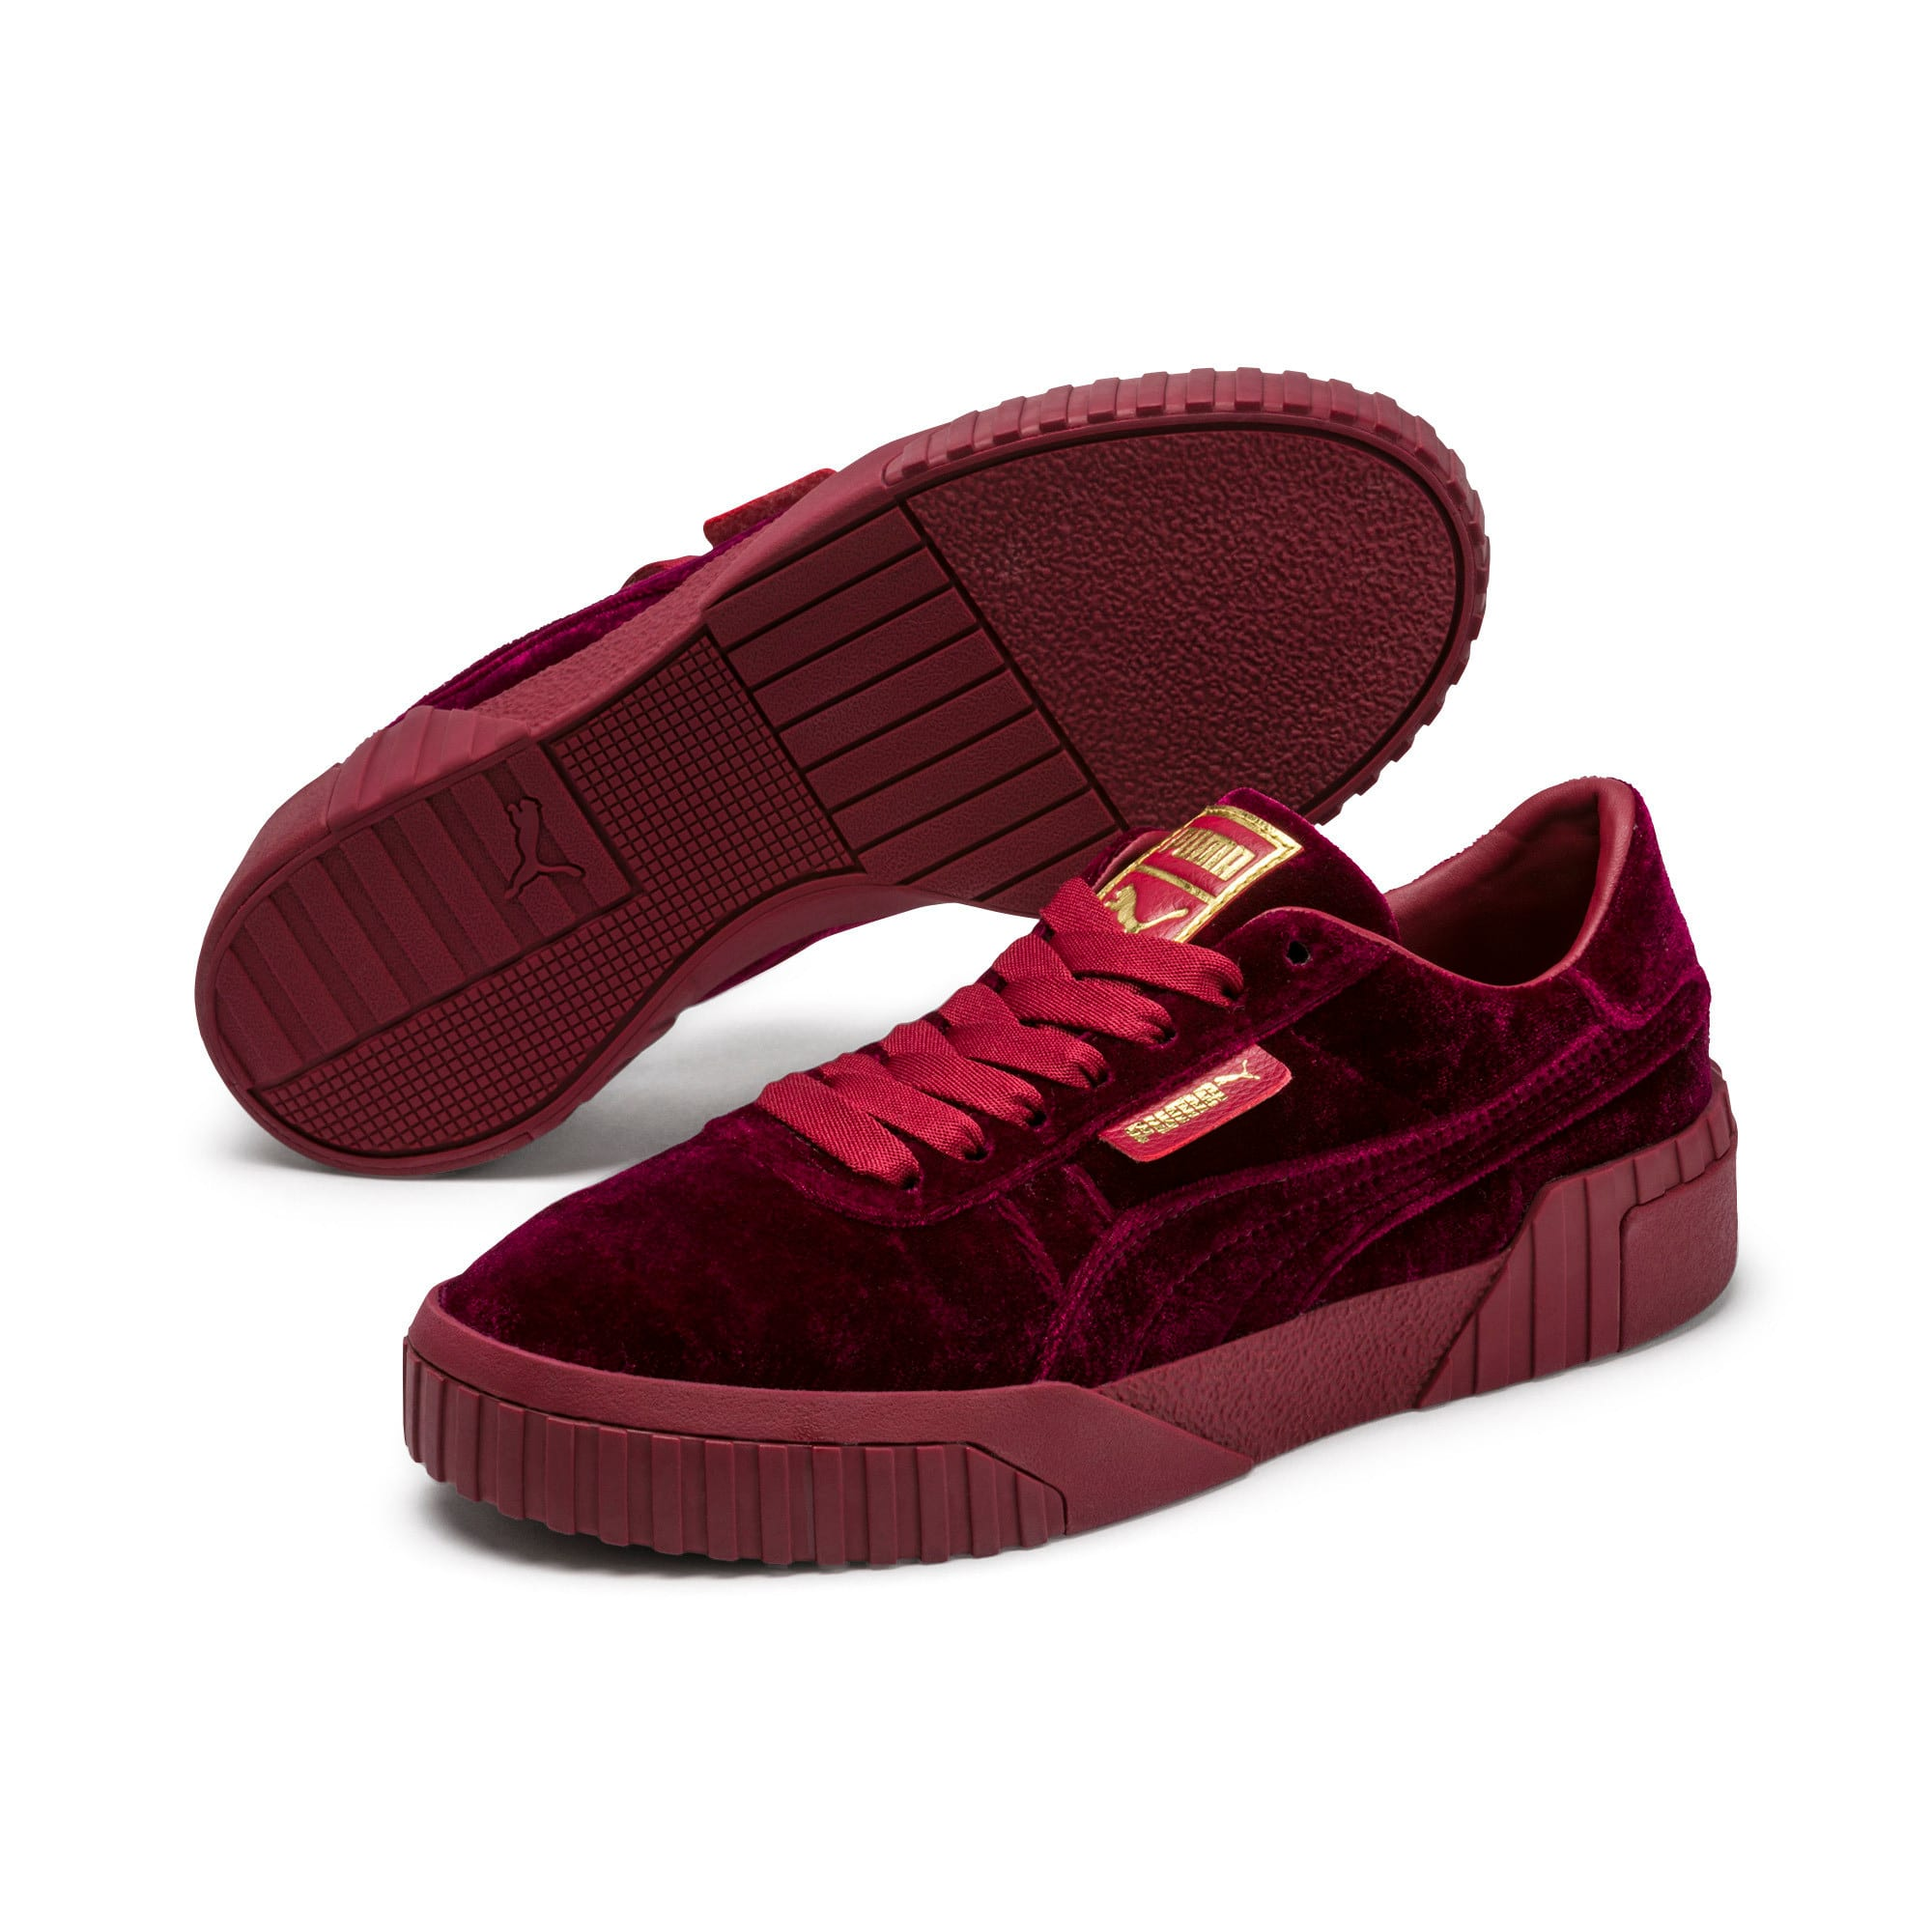 Miniatura 2 de Zapatos deportivosCali Velvetpara mujer, Tibetan Red-Tibetan Red, mediano